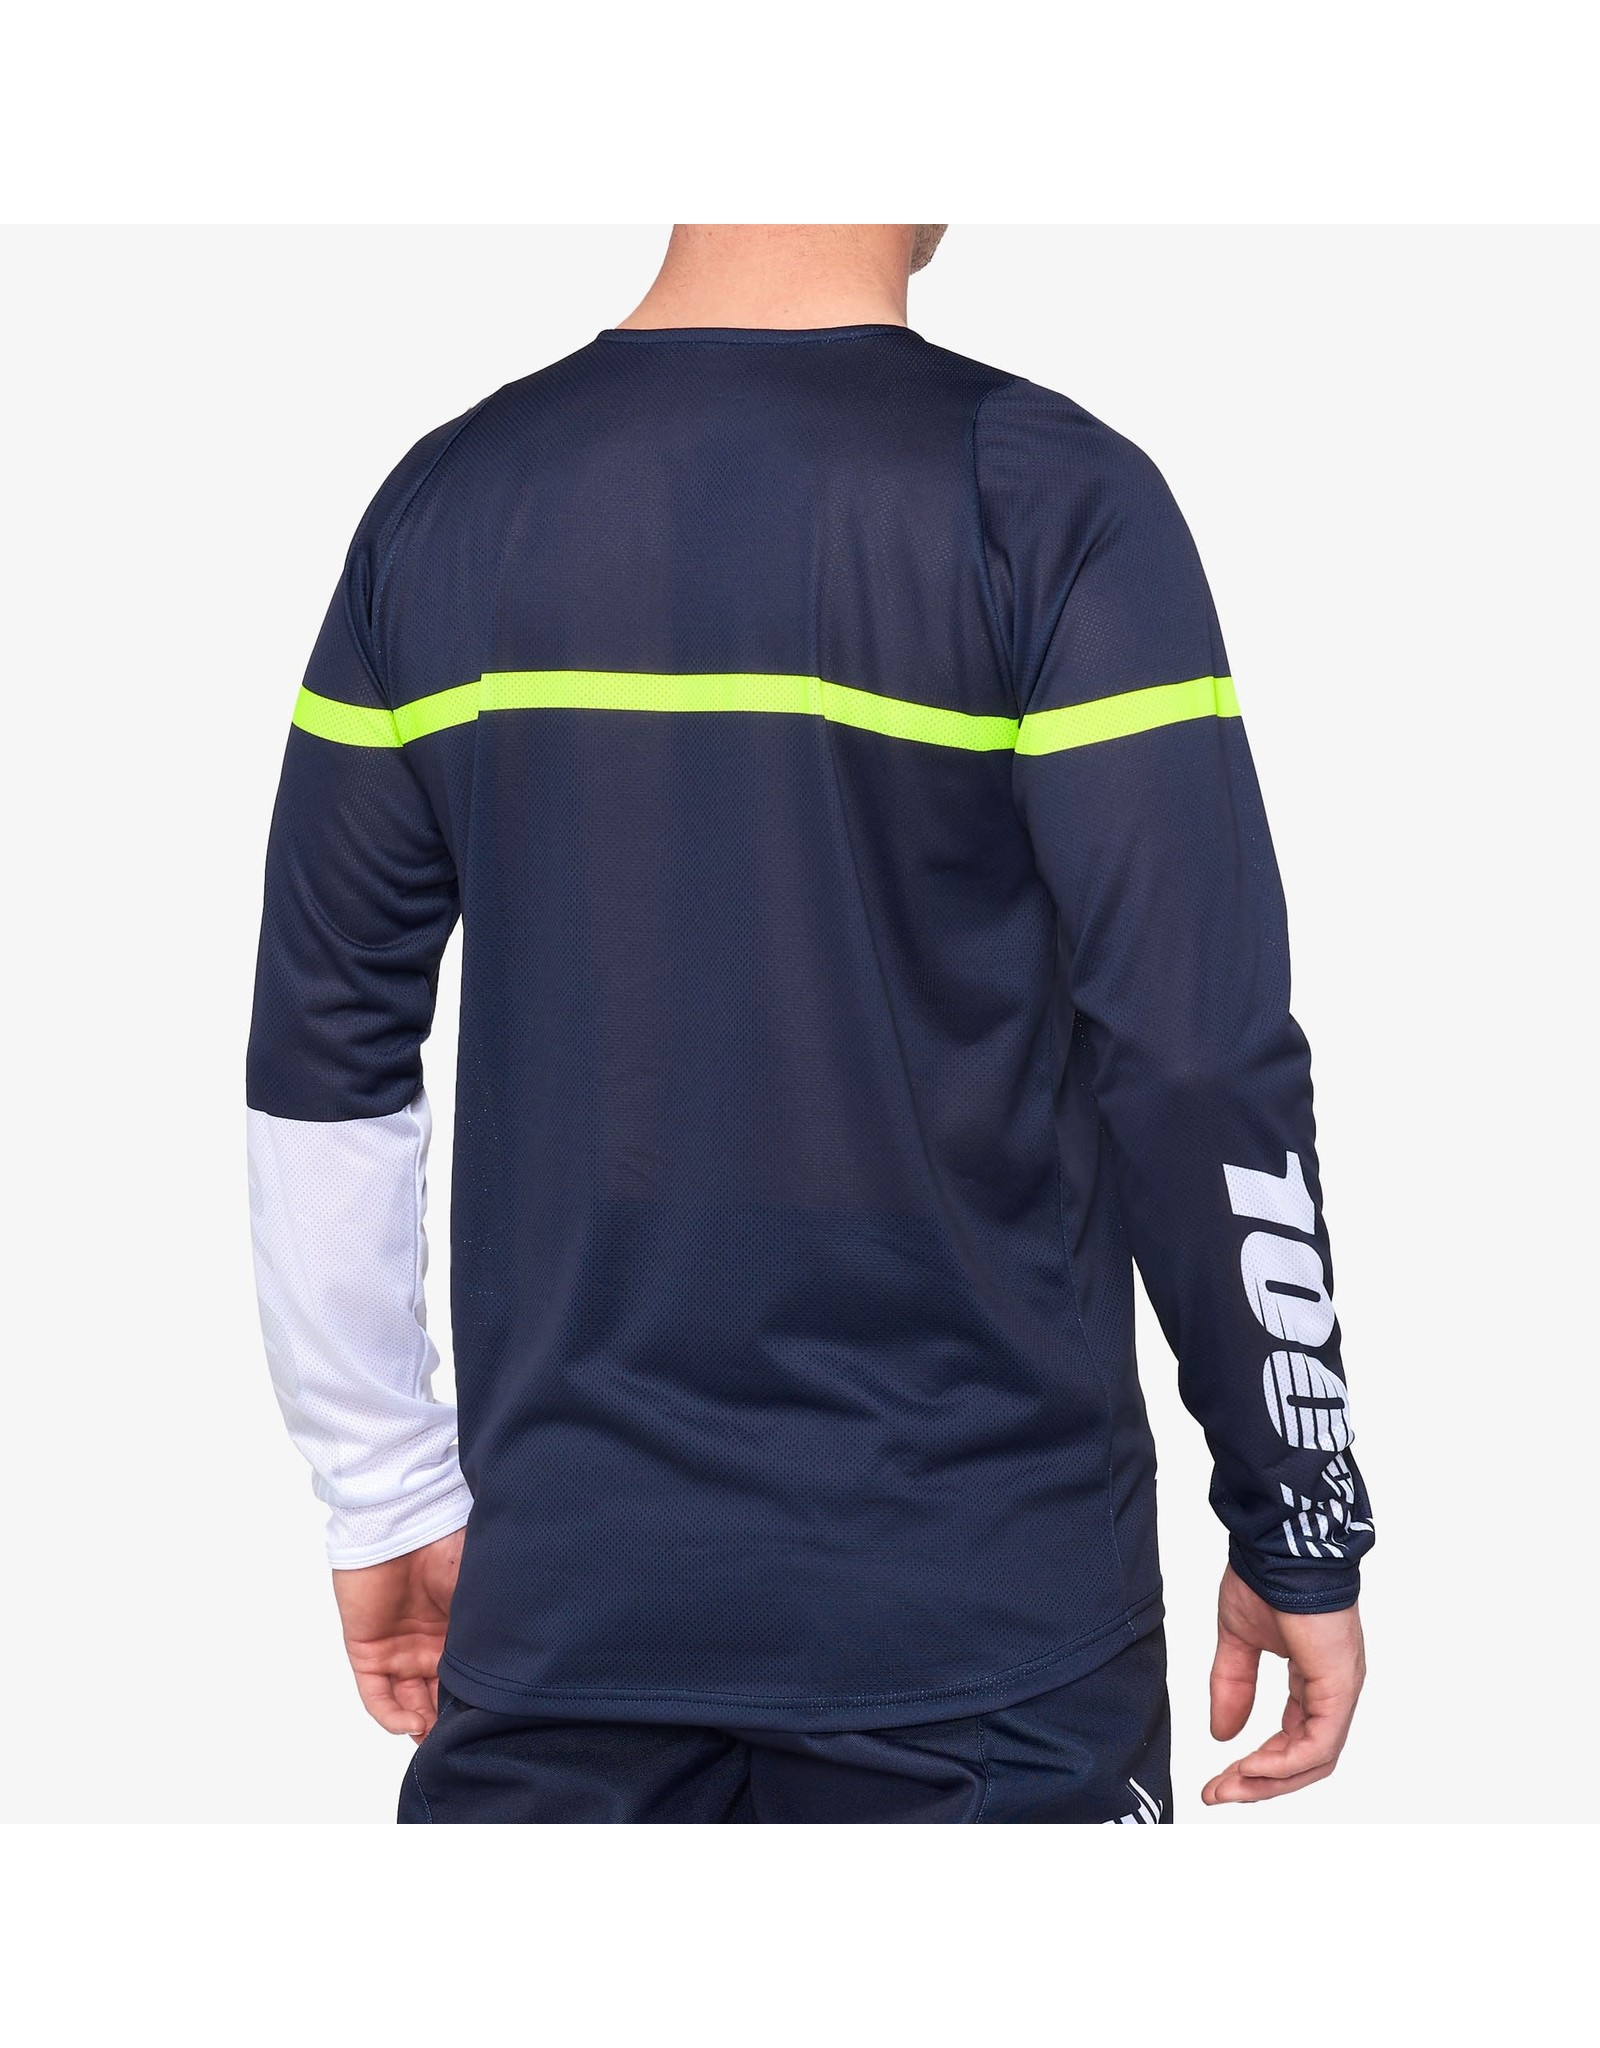 100% 100% - Men's R-CORE Jersey Dark Blue/Yellow - L